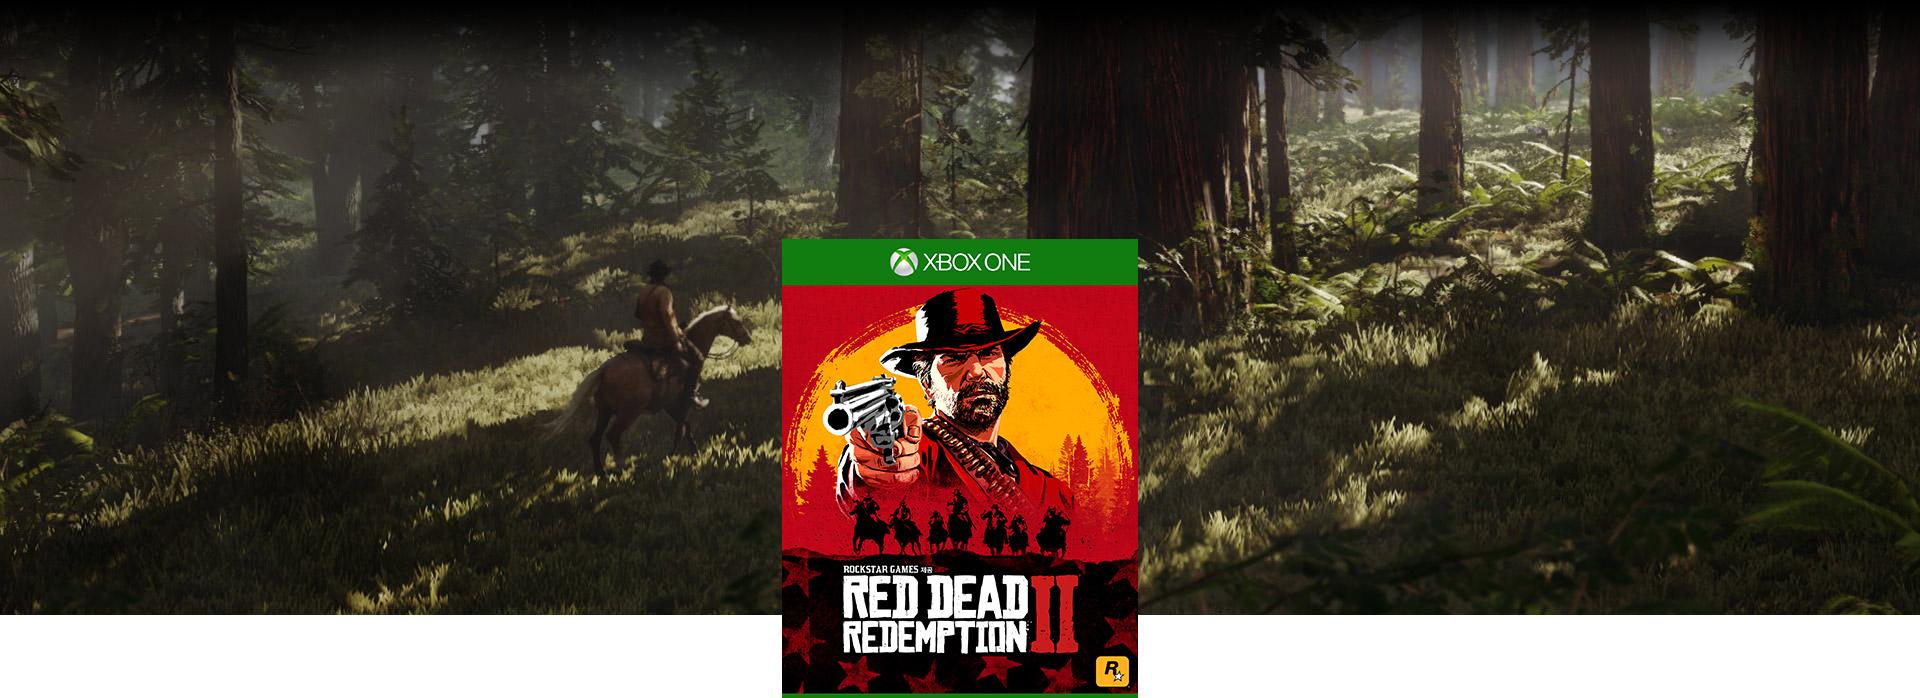 Red Dead Redemption 2 박스 샷으로 문자 백그라운드에서 숲을 통해 말을 타고